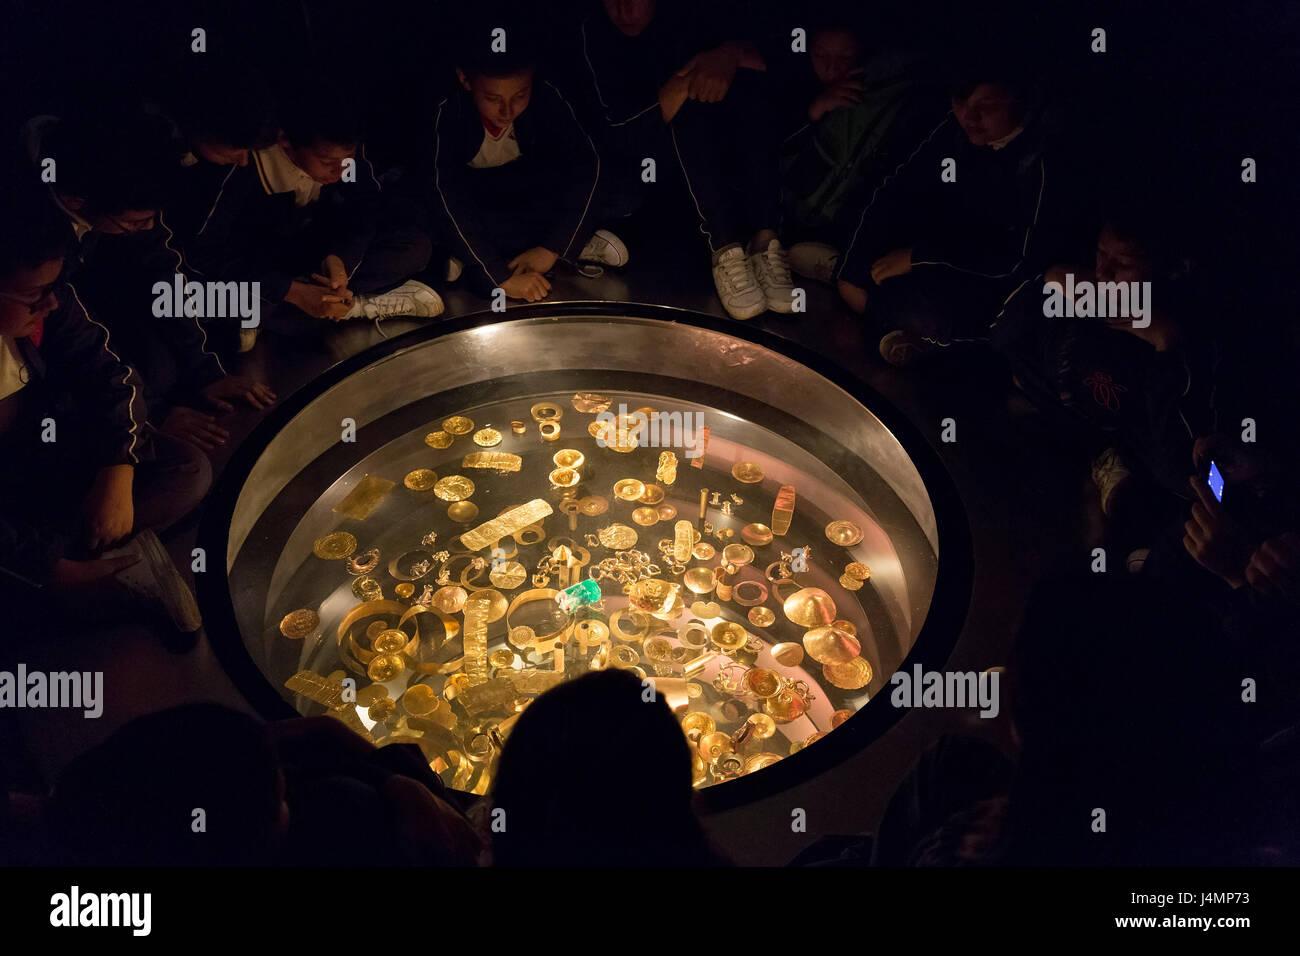 Gold Museum (El Museo del Oro) in Bogota, Colombia - Stock Image